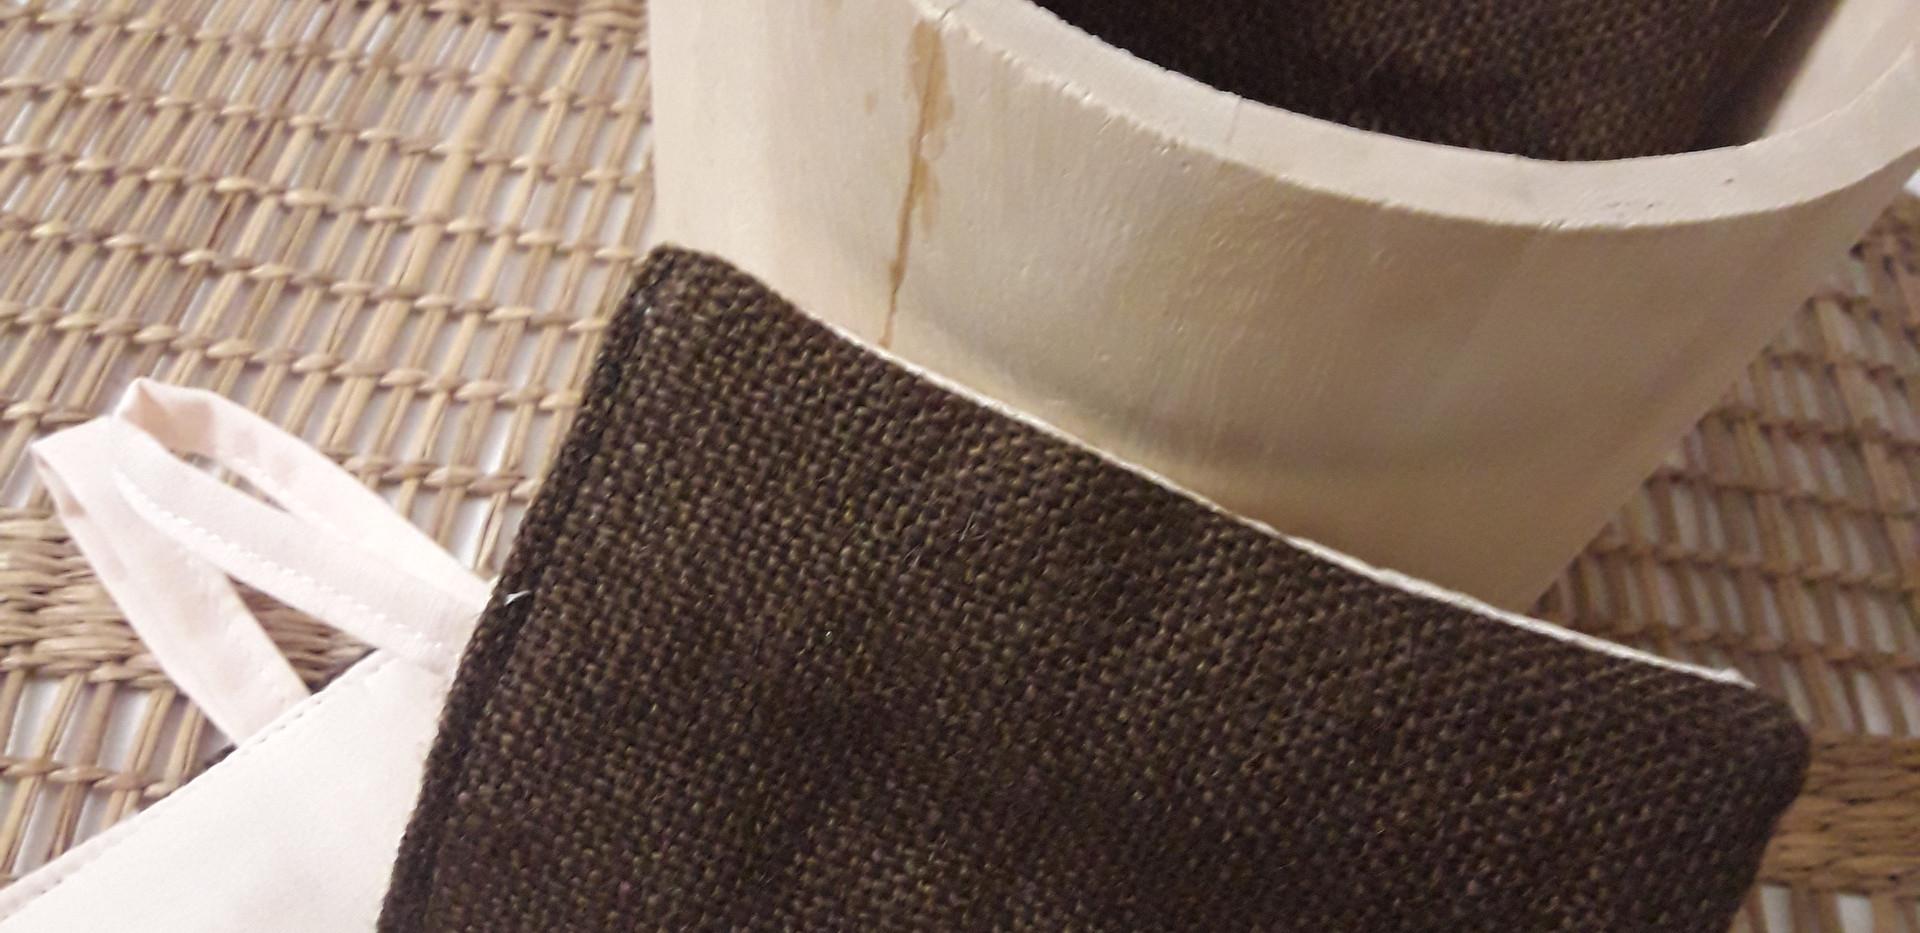 éponge textile.jpg